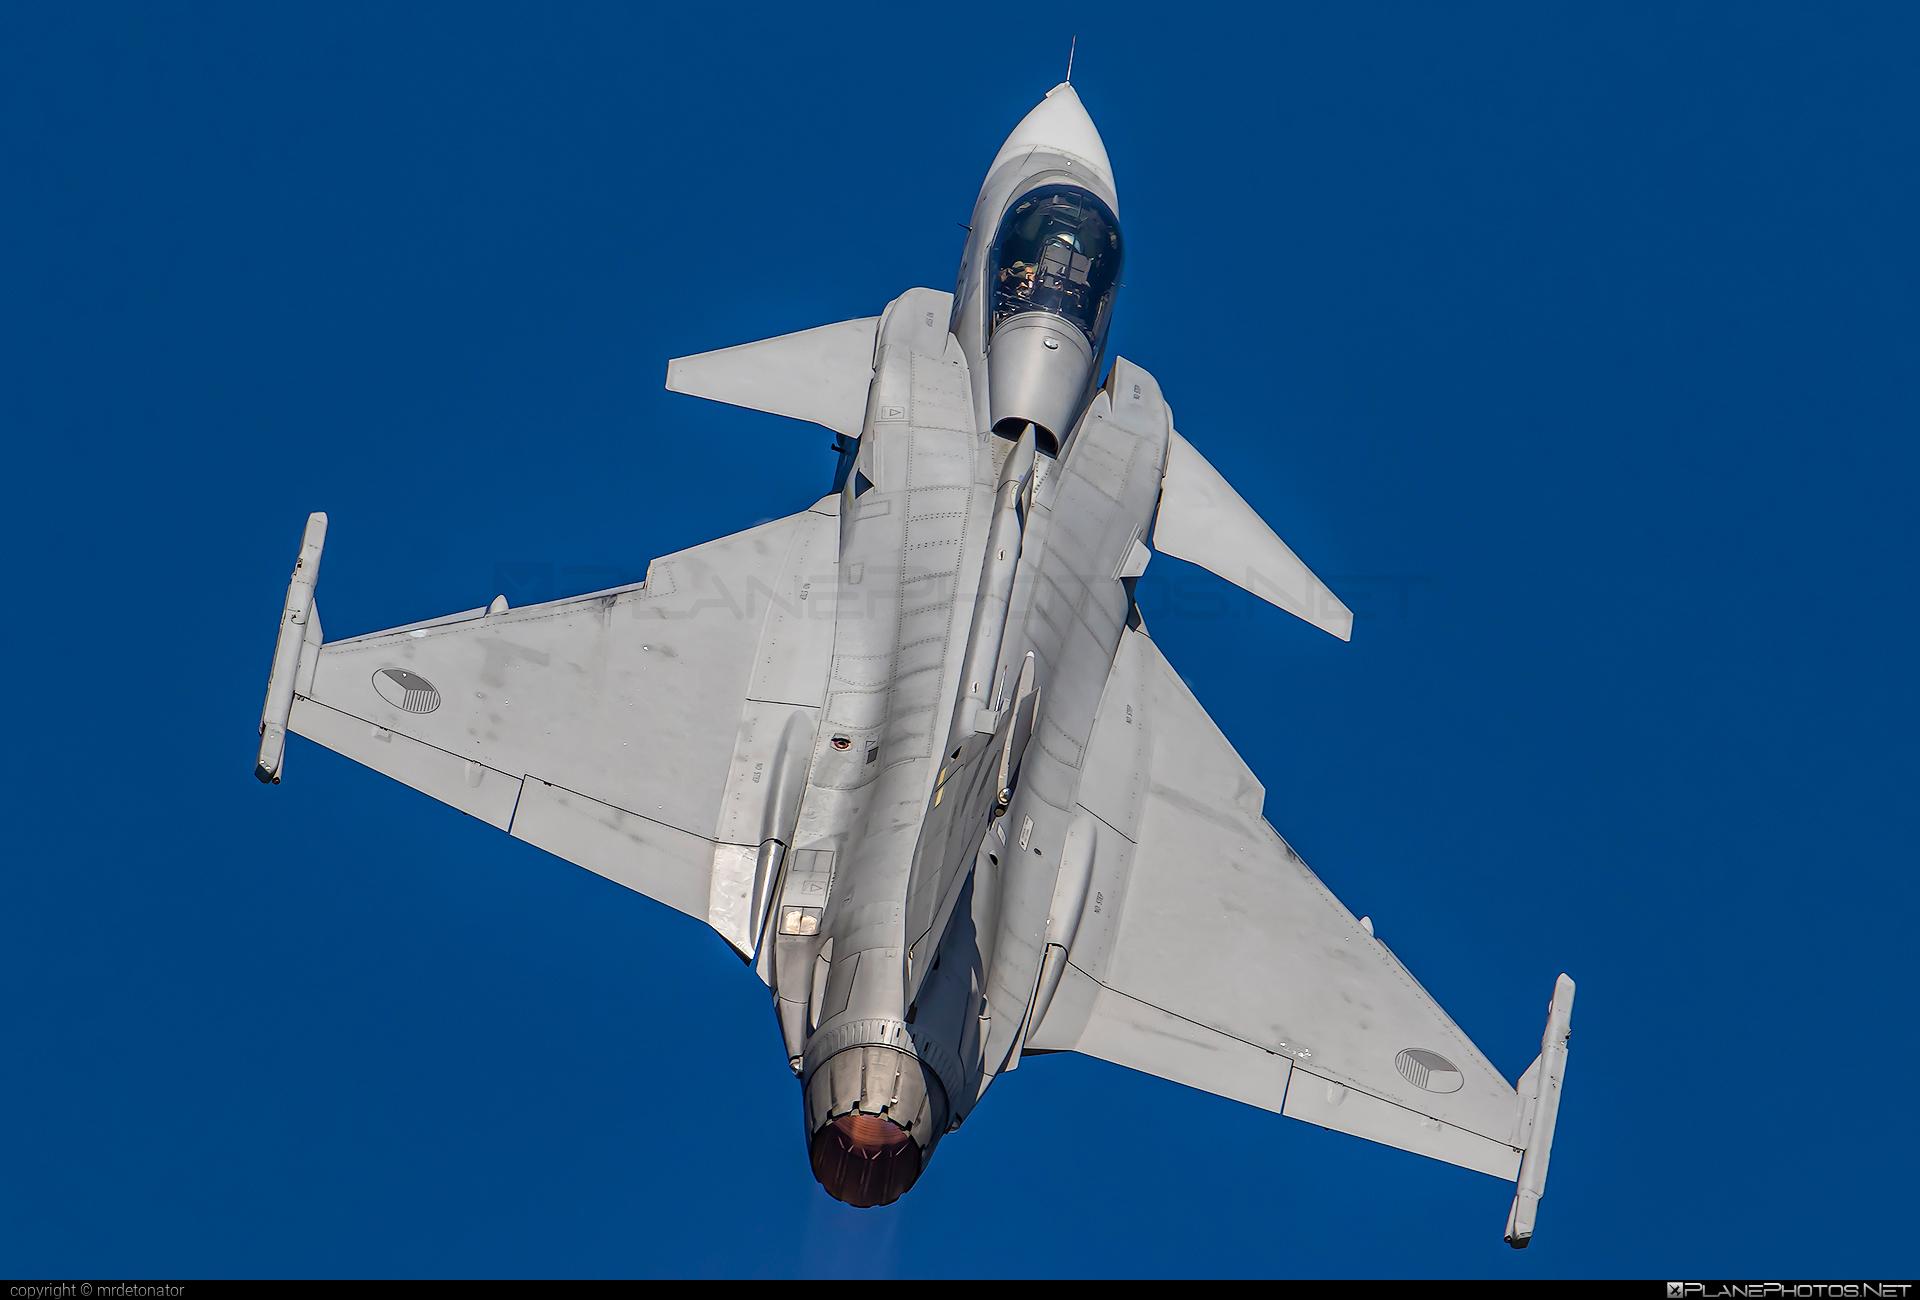 Saab JAS 39C Gripen - 9242 operated by Vzdušné síly AČR (Czech Air Force) #czechairforce #gripen #jas39 #jas39c #jas39gripen #natodays2019 #saab #vzdusnesilyacr